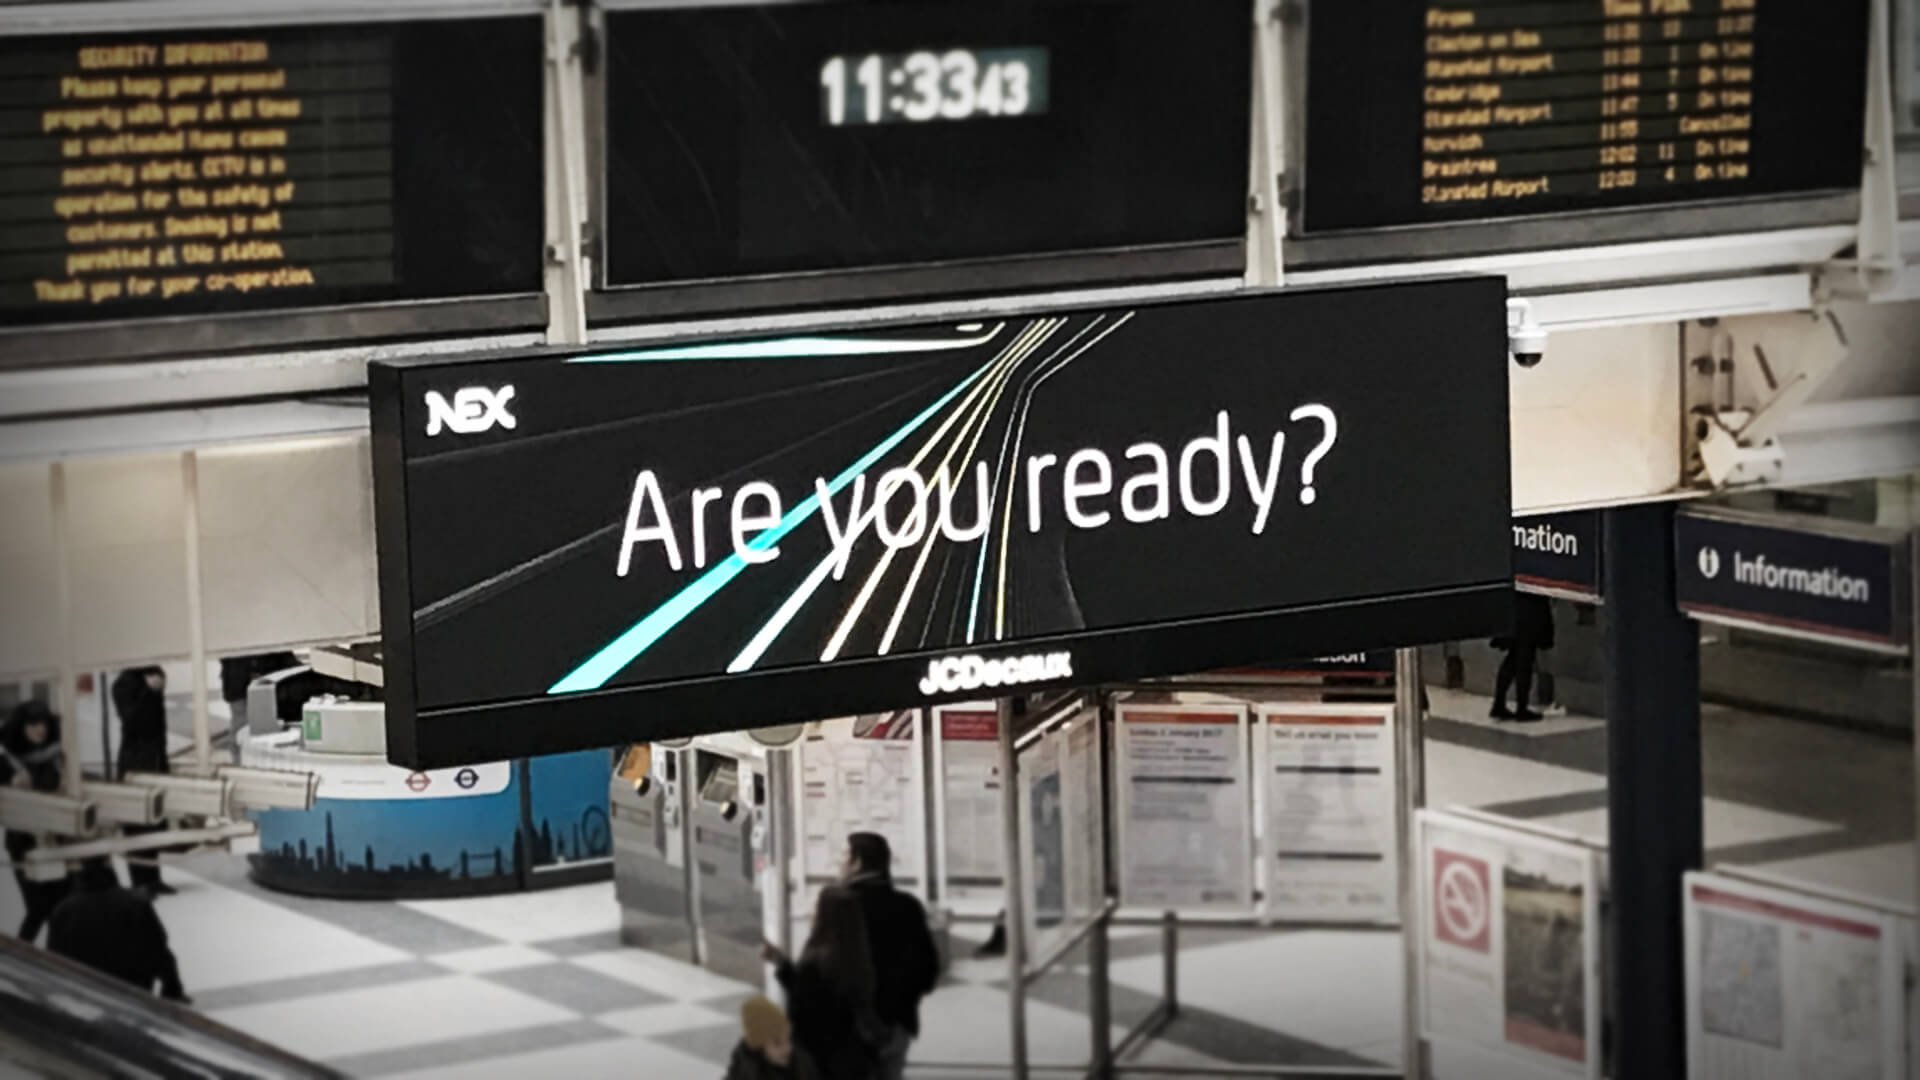 nex advertsing campaign liverpool street